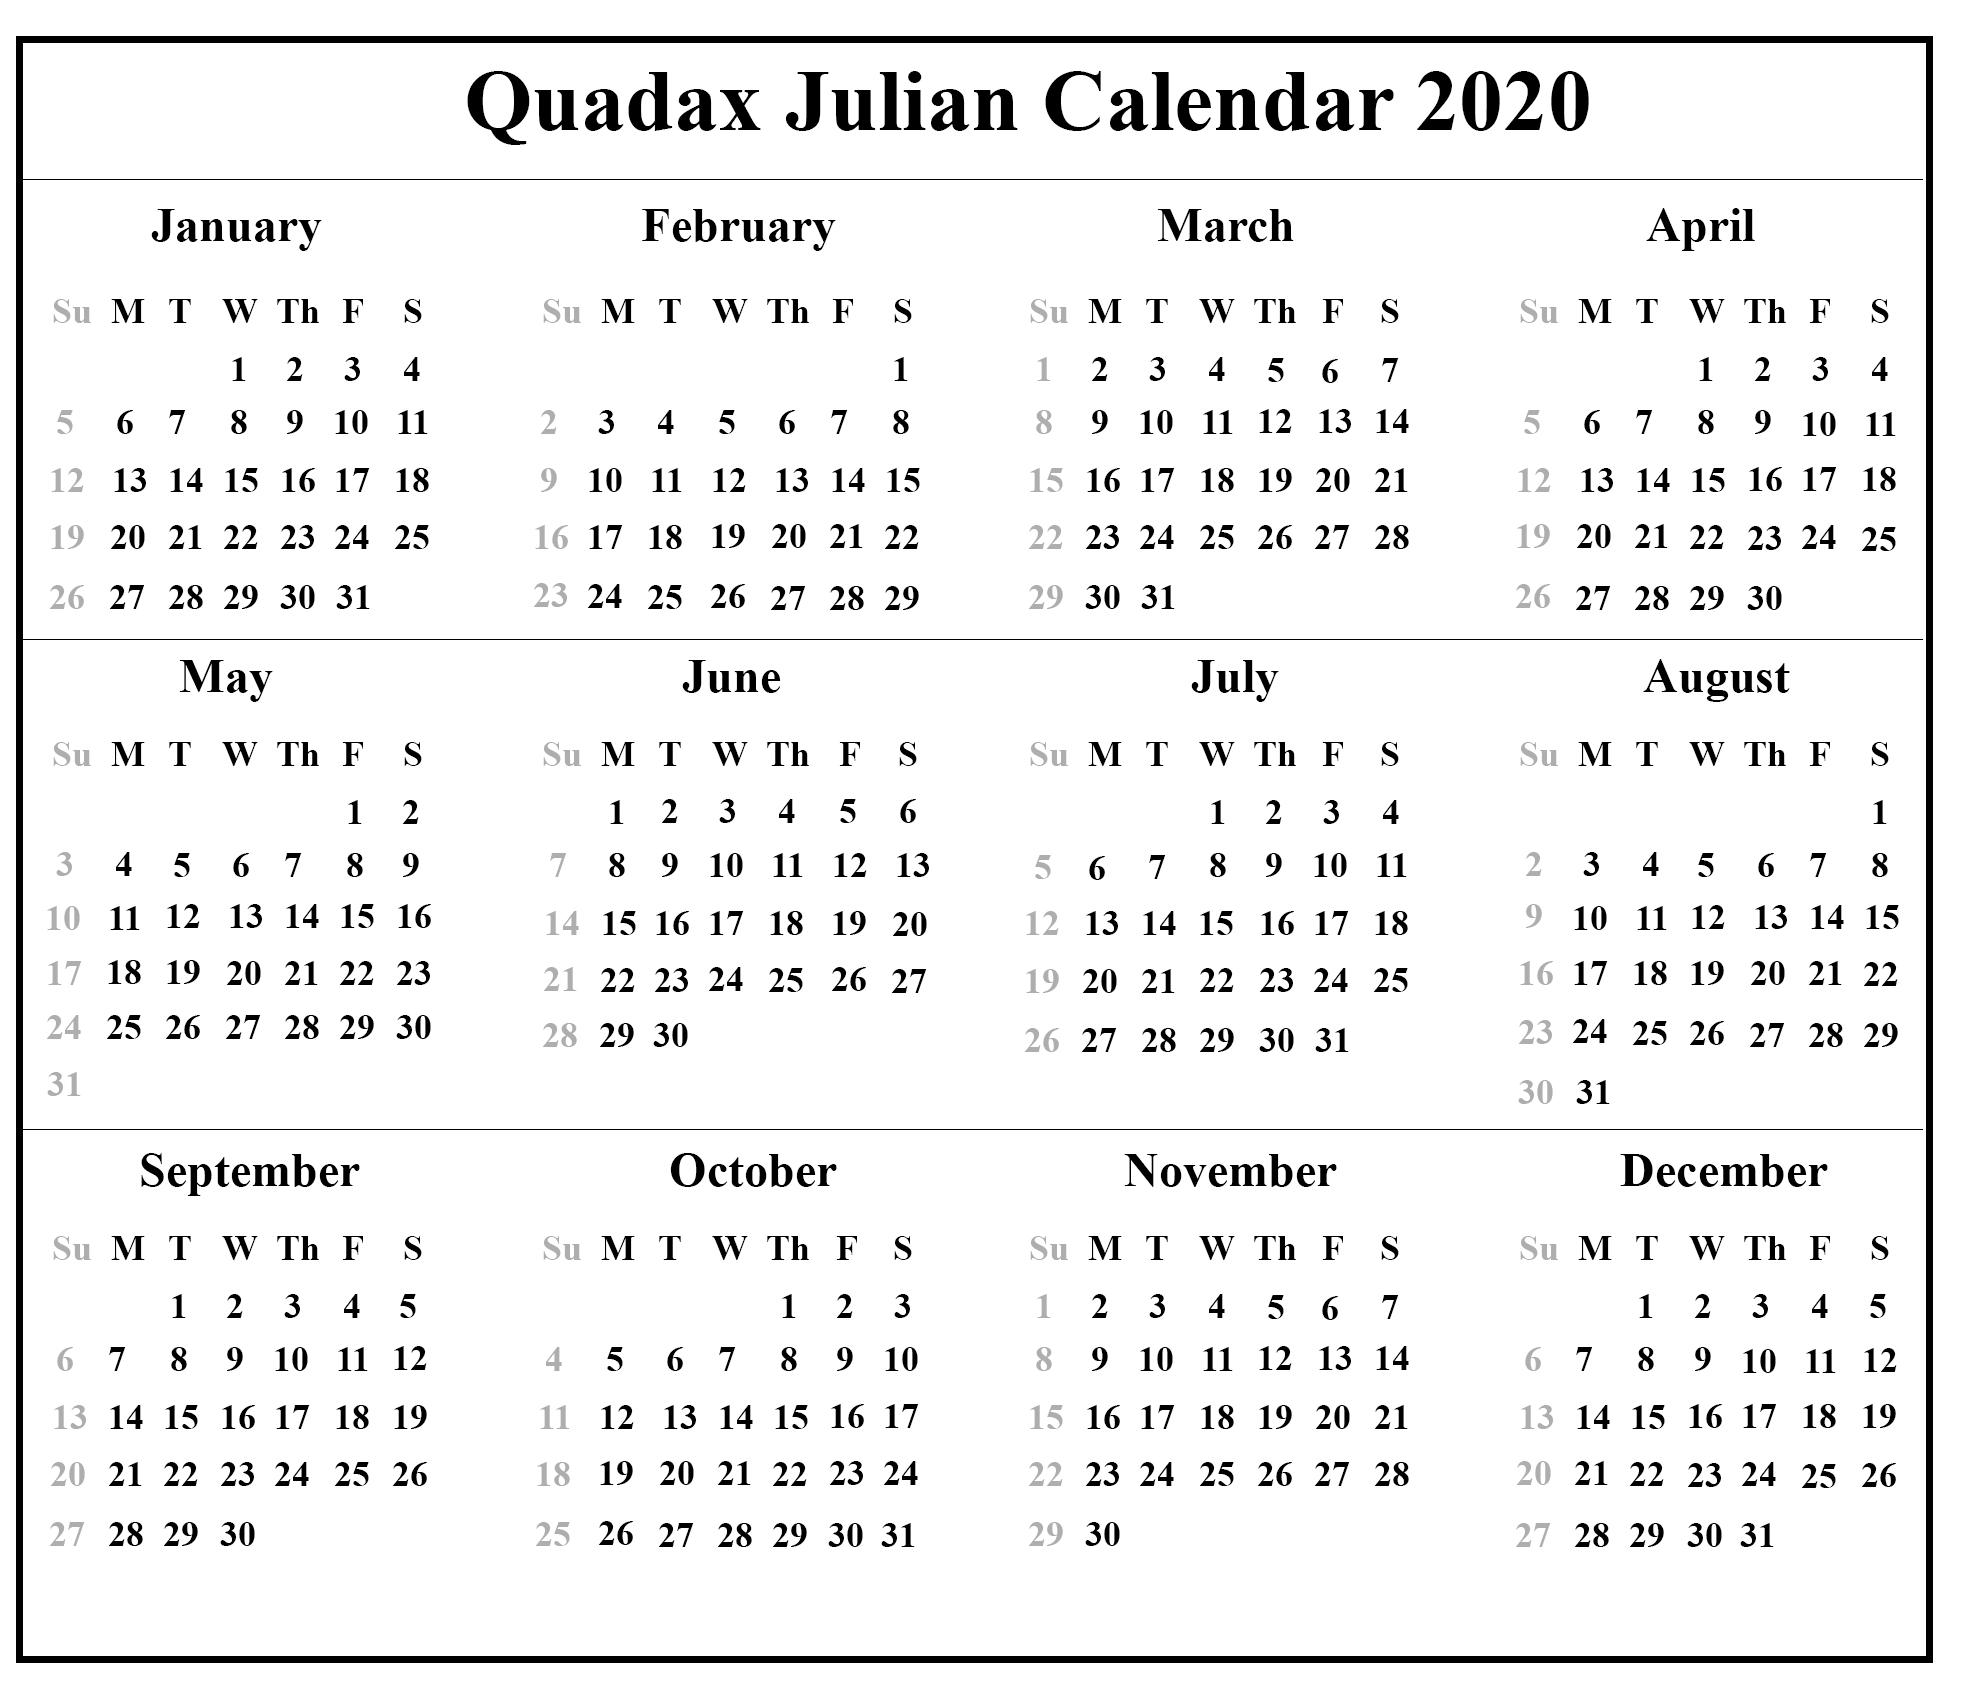 Julian Calendar 2020 Pdf Quadax | Example Calendar Printable with regard to Julian Calendar 2020 - Quadax